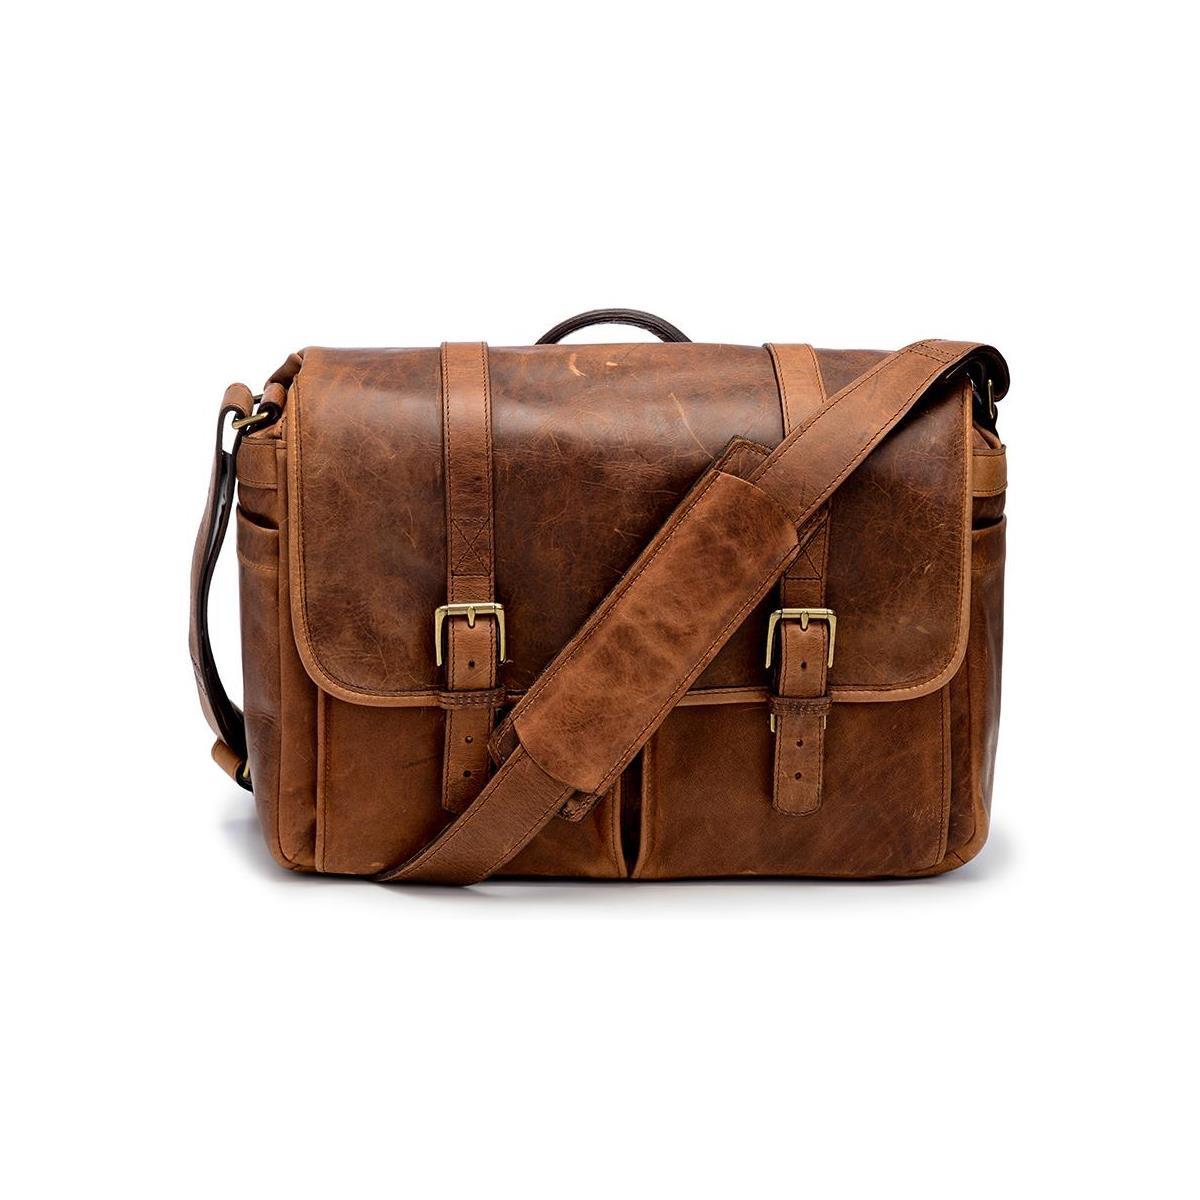 88e1c576fedf ONAThe Brixton for Leica, Leather Camera Bag - Antique Cognac - Ace Photo